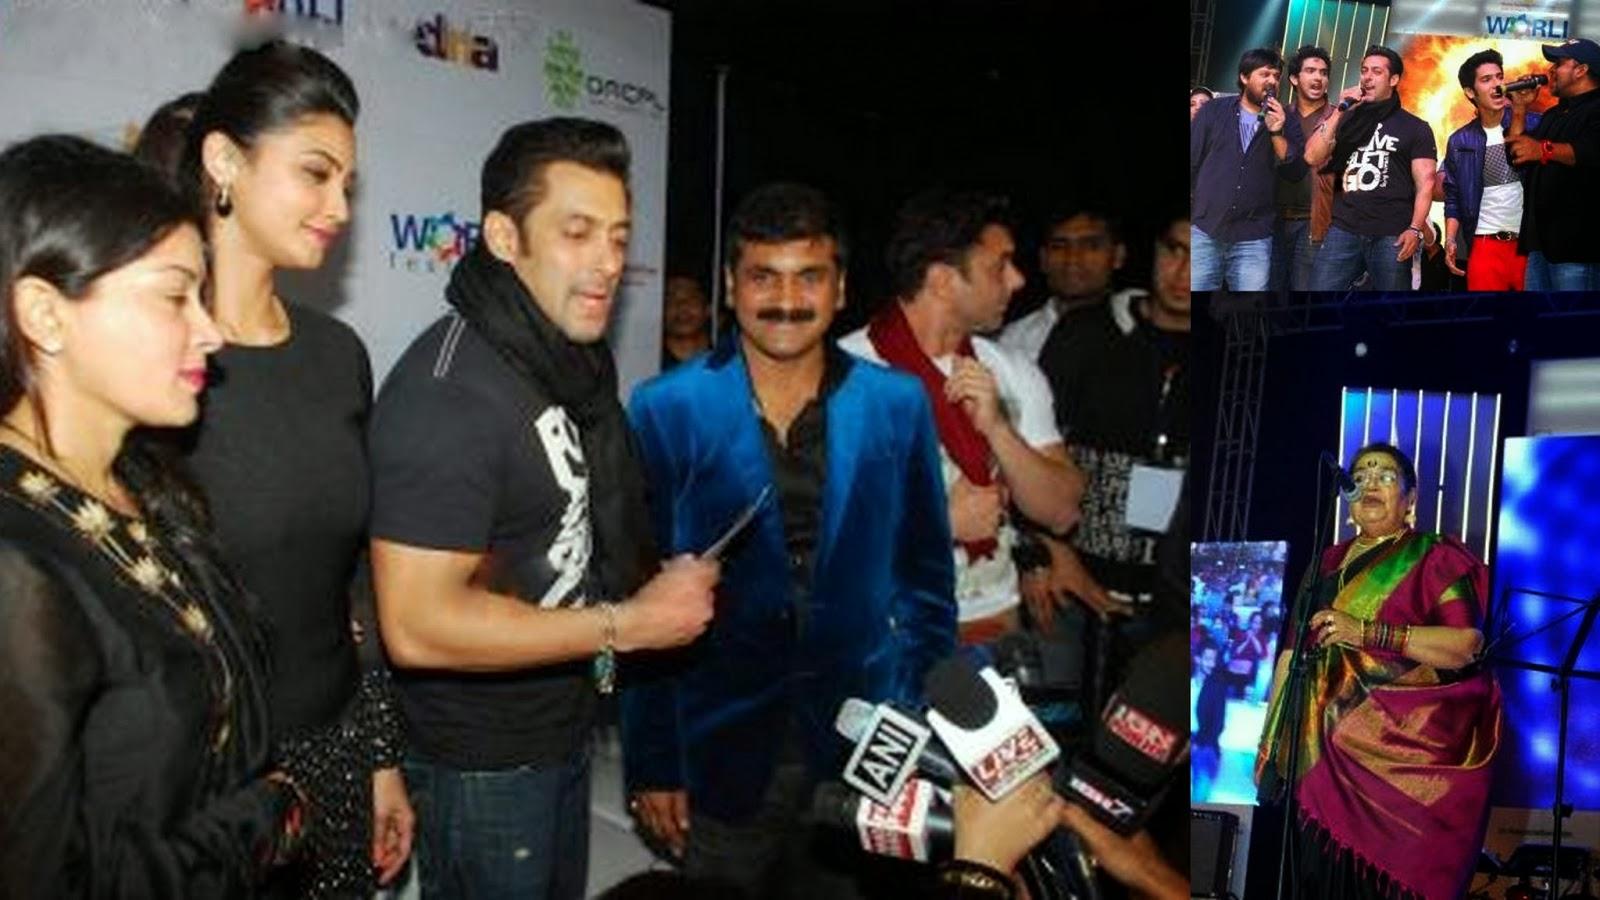 Jai Ho Promotion with Salman Khan at Worli, Mumbai